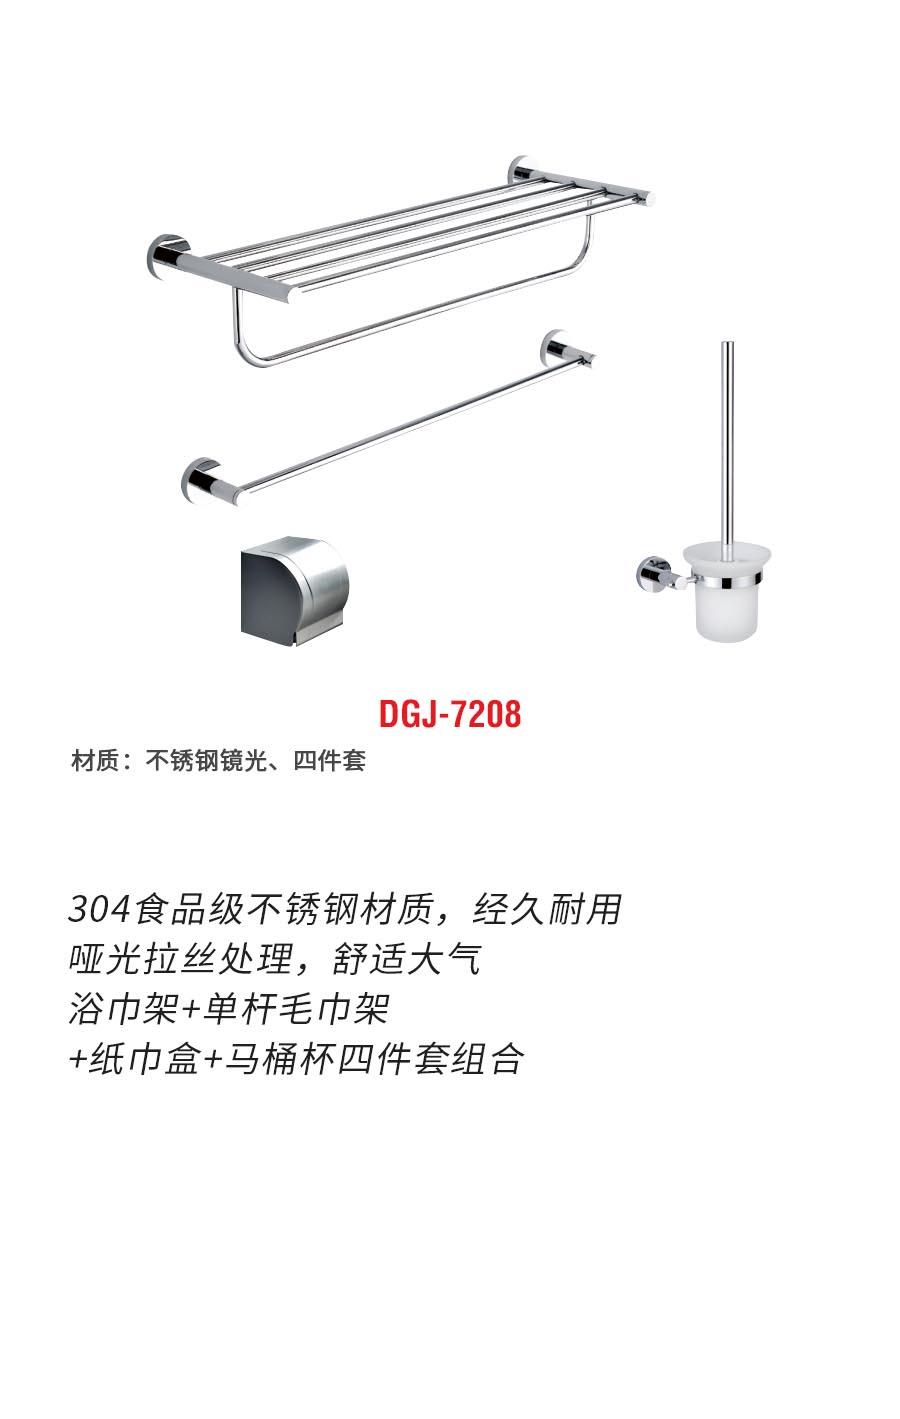 DGJ-7208b.jpg